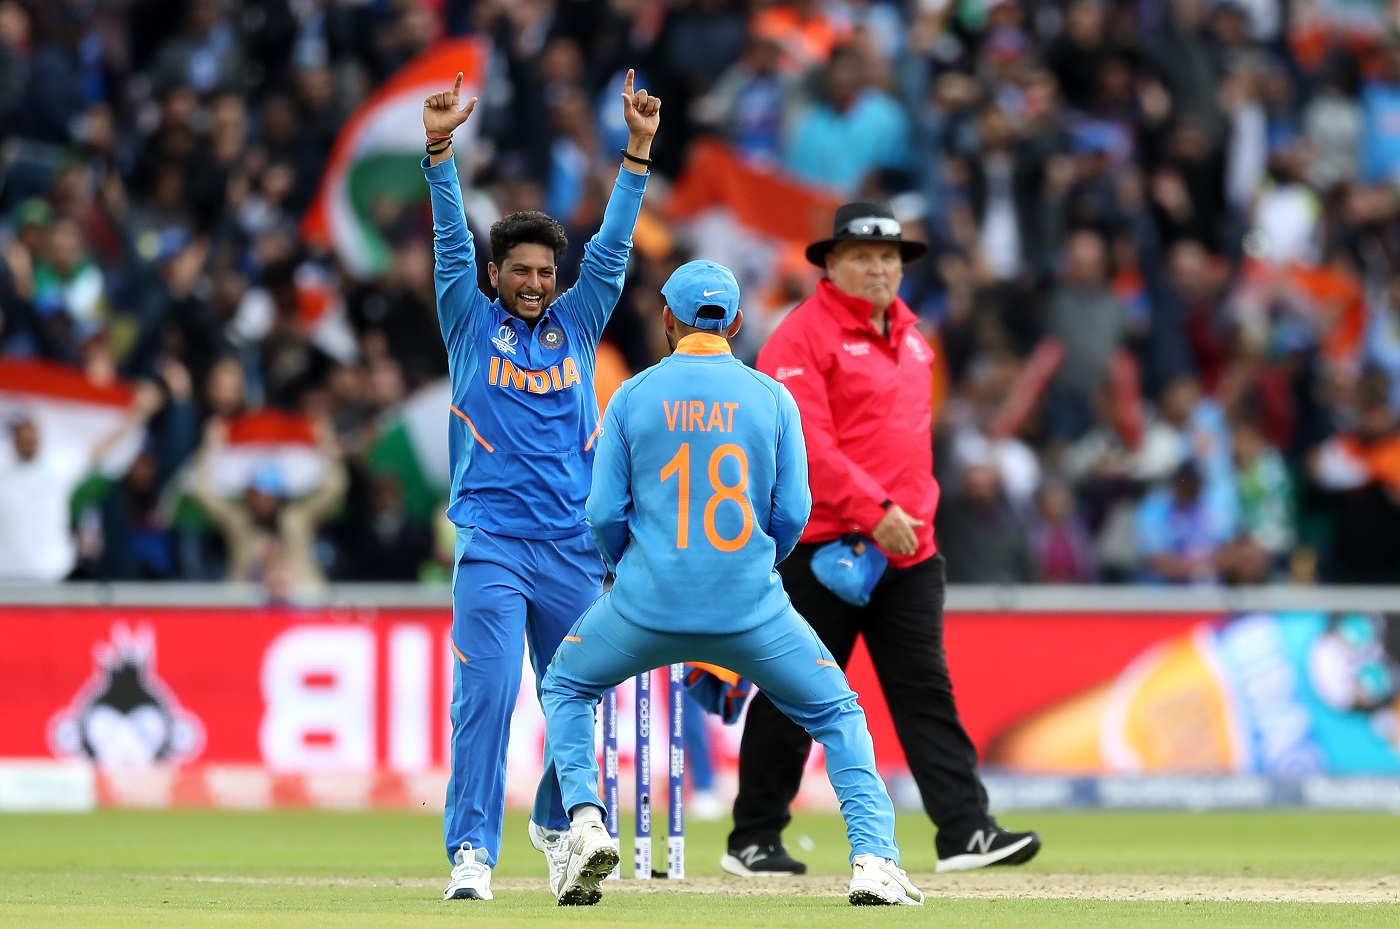 ICC World Cup 2019: I Never Lost My Bowling Rhythm, Asserts Kuldeep Yadav